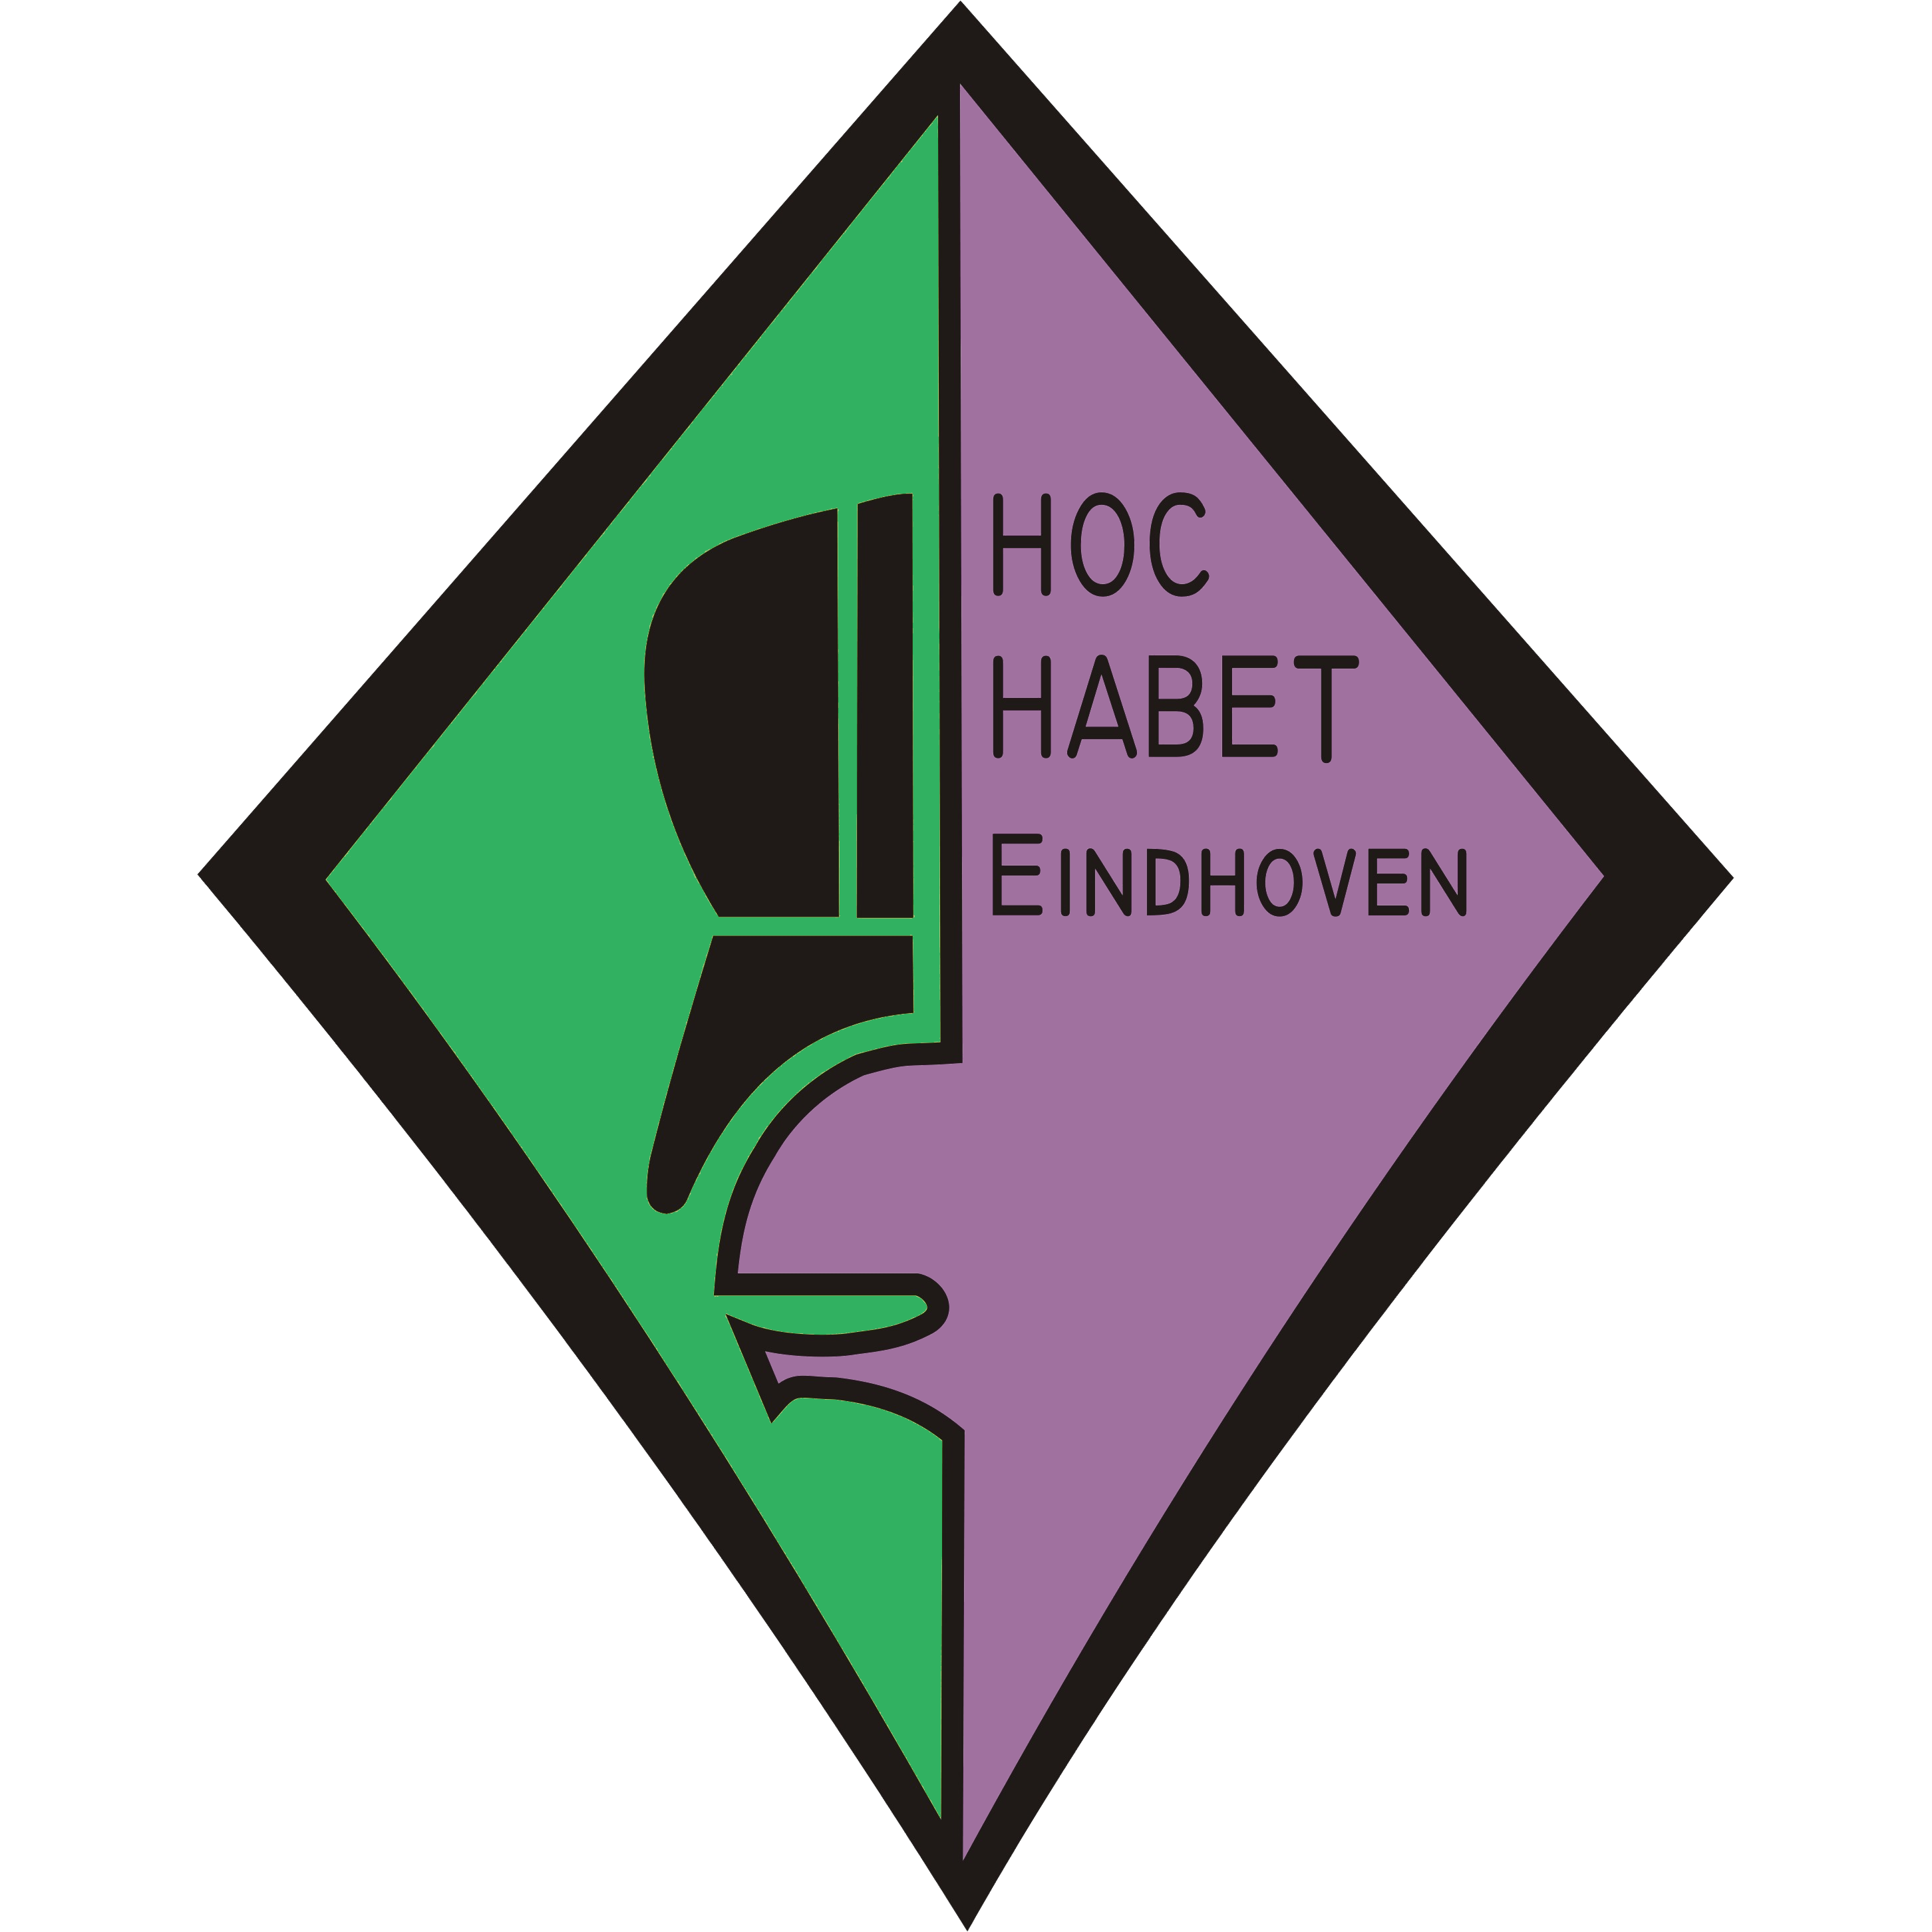 E.S.S.V. Hoc Habet